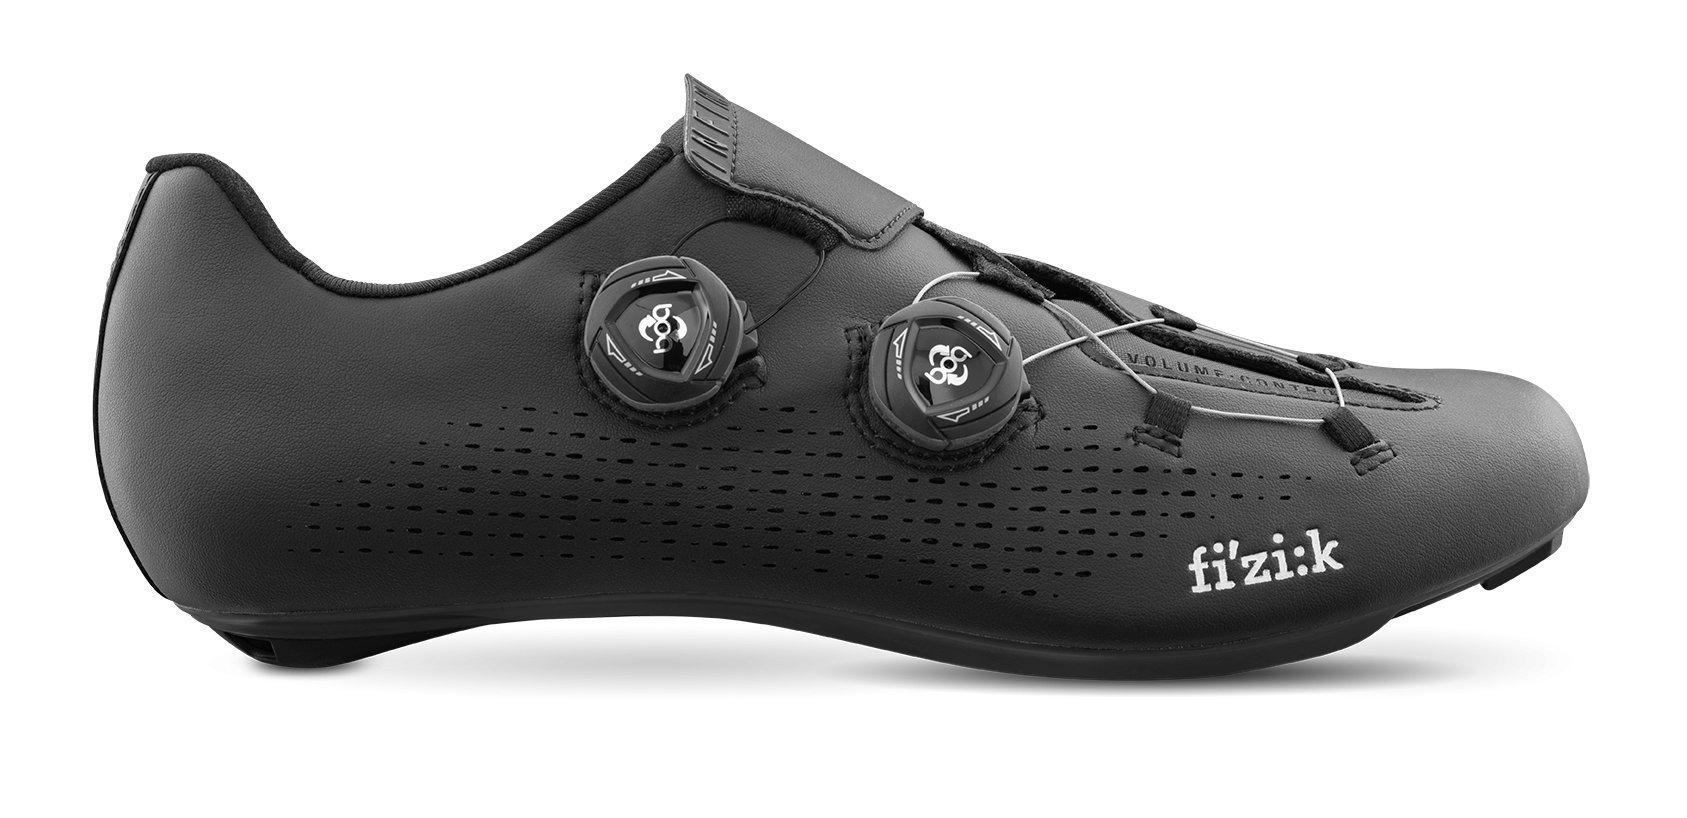 Fizik R1 INFINITO Shoes, Black, Size 37.5